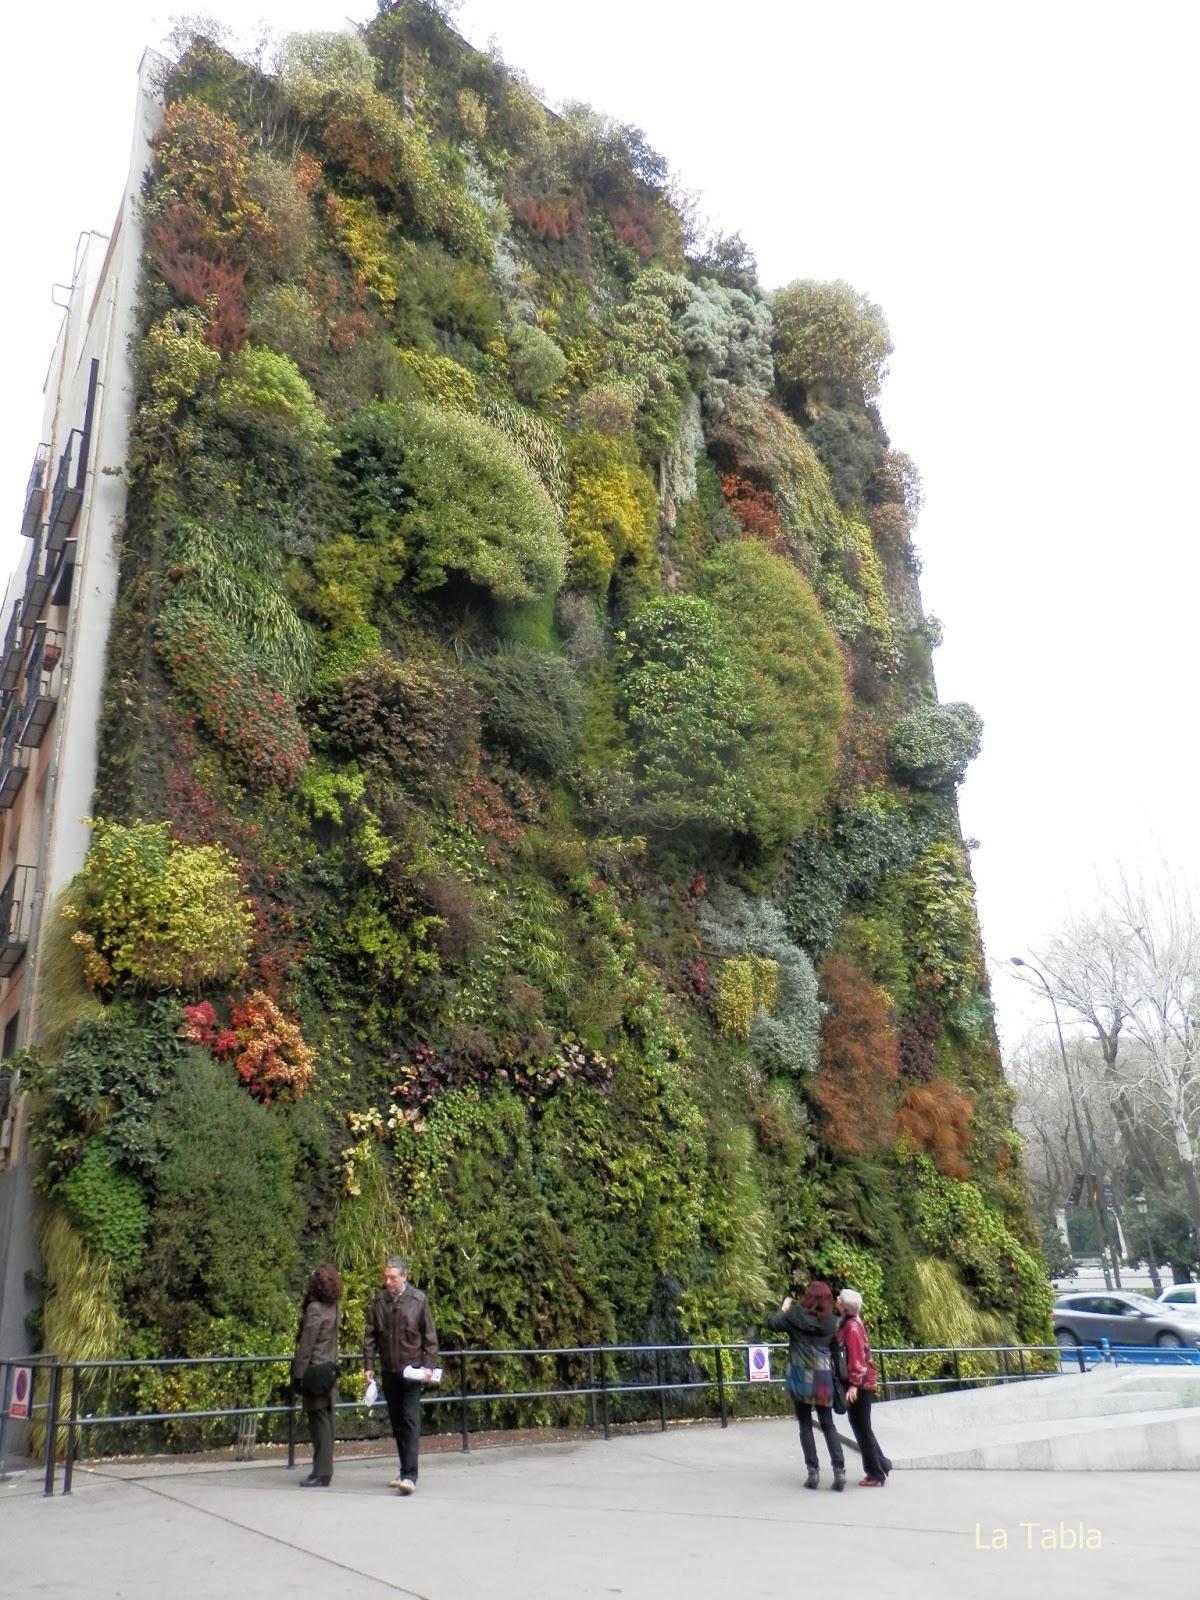 Jard n vertical caixa forum en diciembre 2012 - El jardin vertical ...